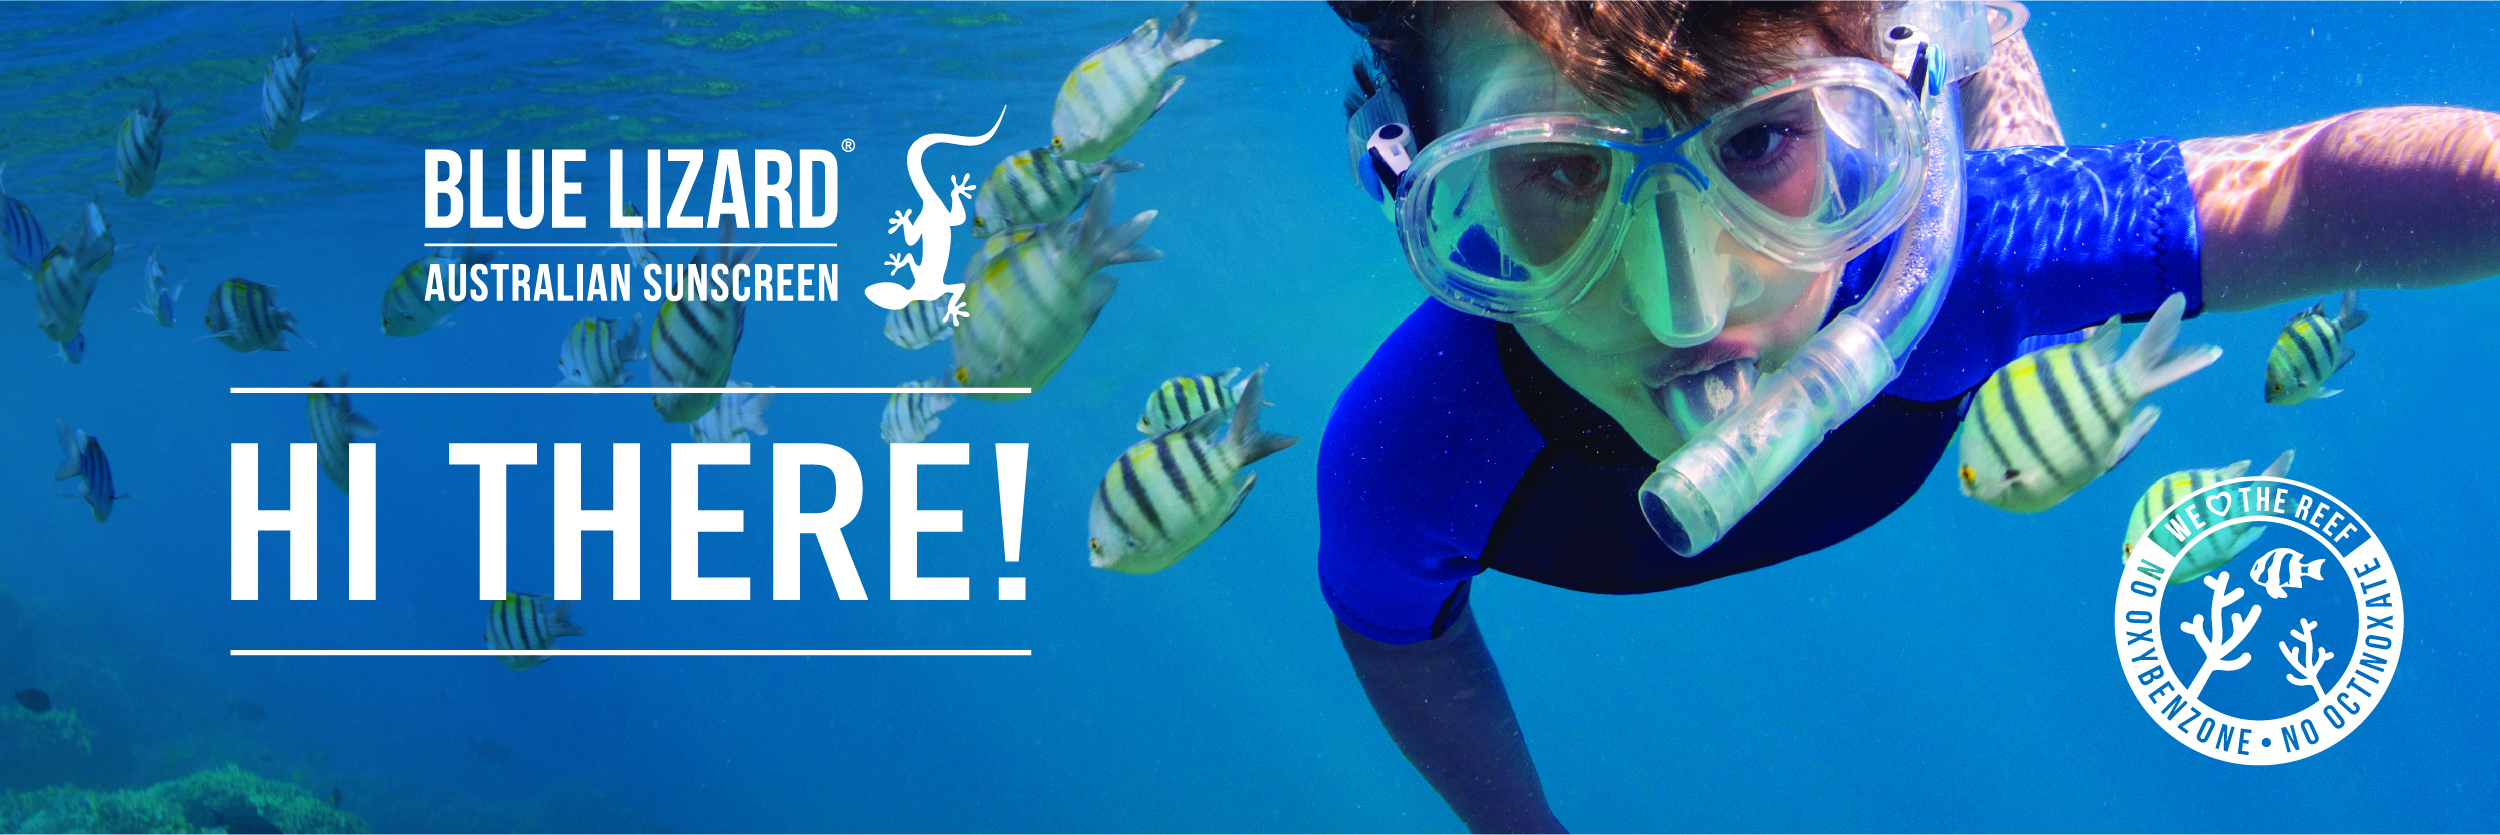 Hi there! - Blue Lizard Australian Sunscreen - We Love the Reef!